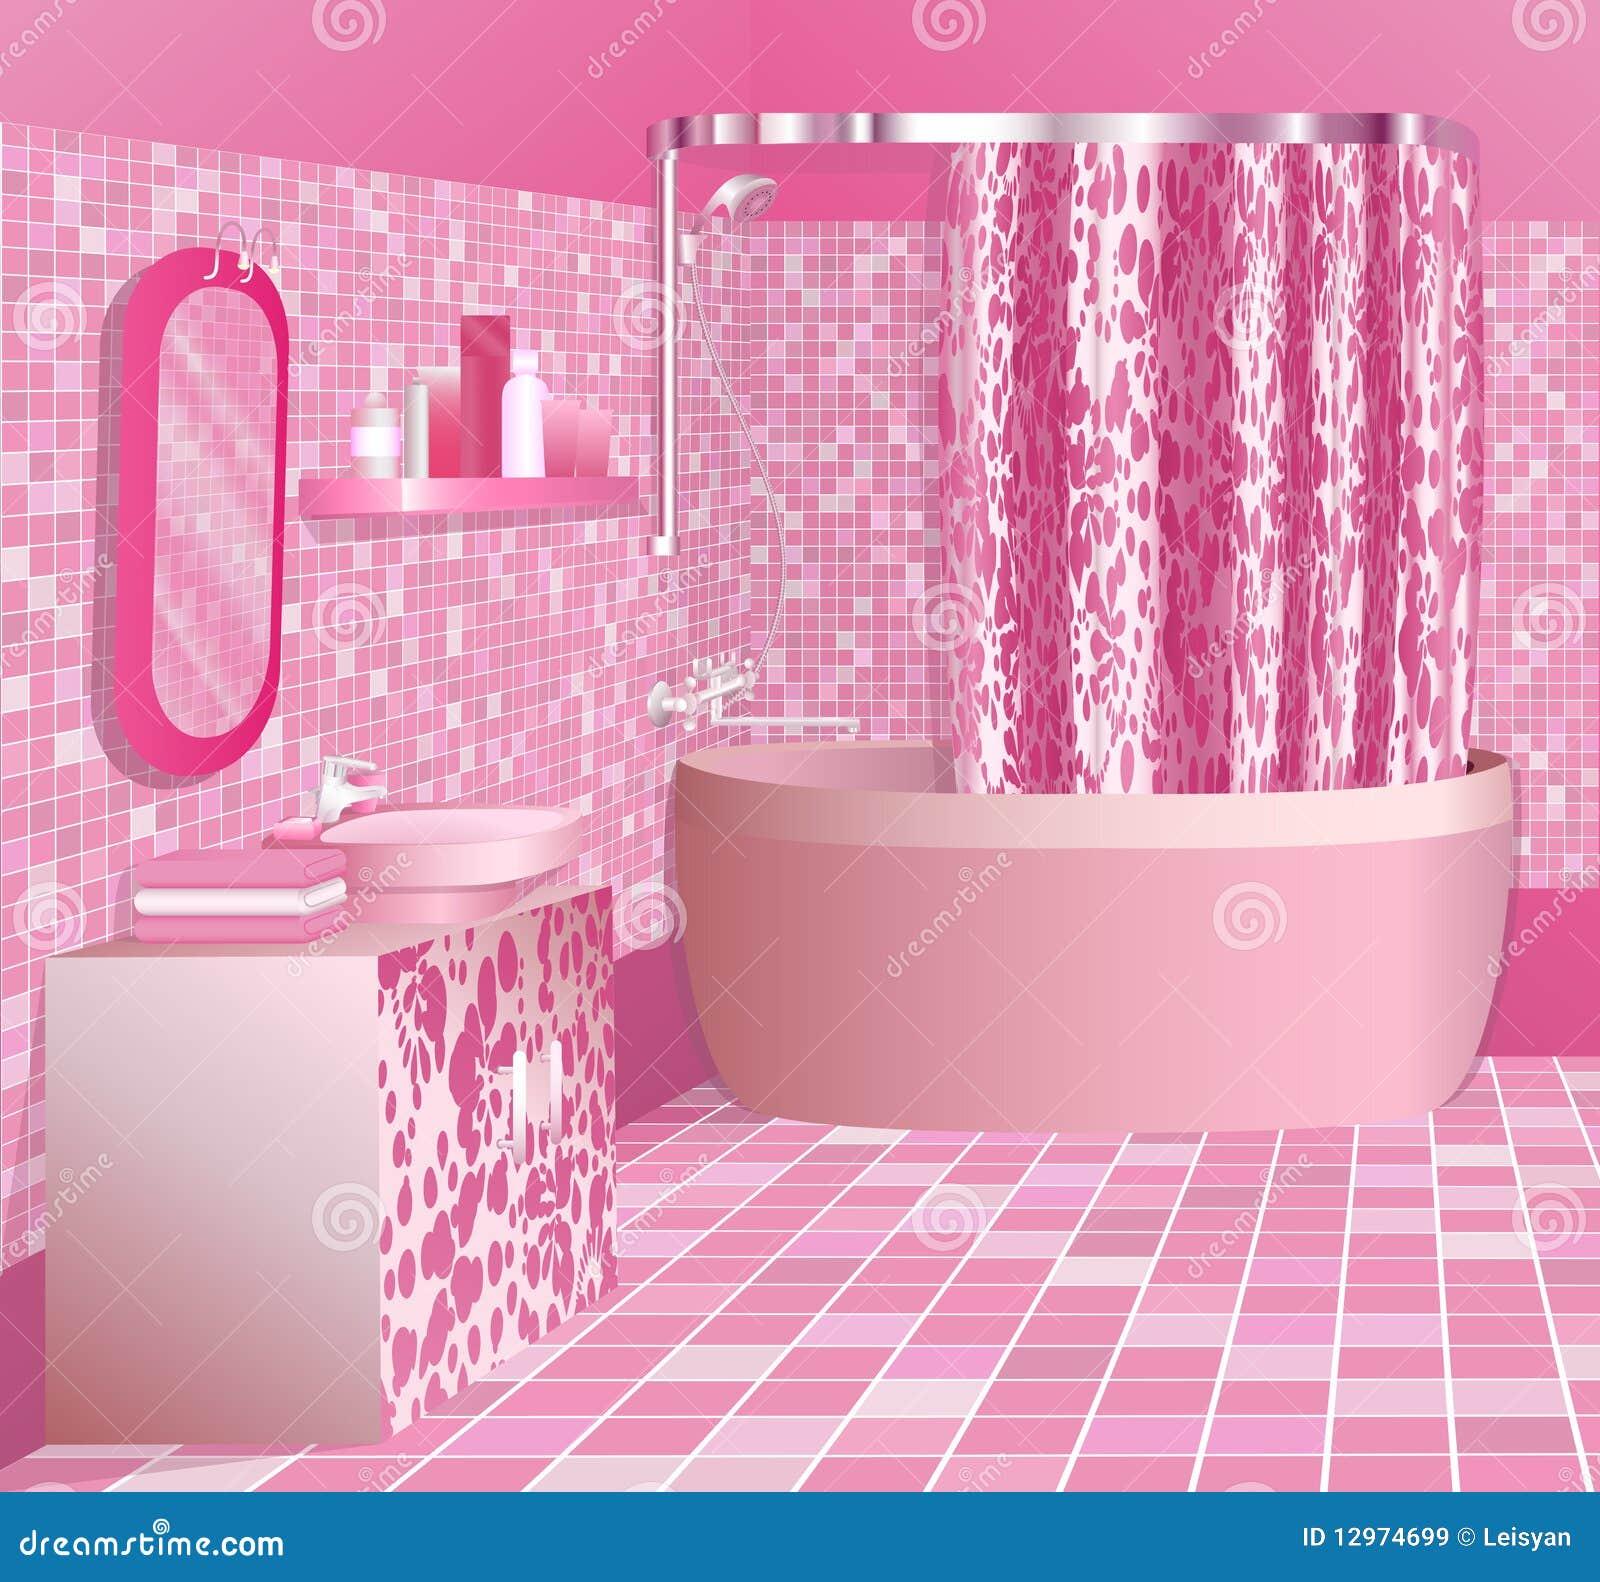 Banheiro Corderosa Luxuoso Imagens de Stock Royalty Free  Imagem 12974699 -> Banheiro Feminino Vetor Free